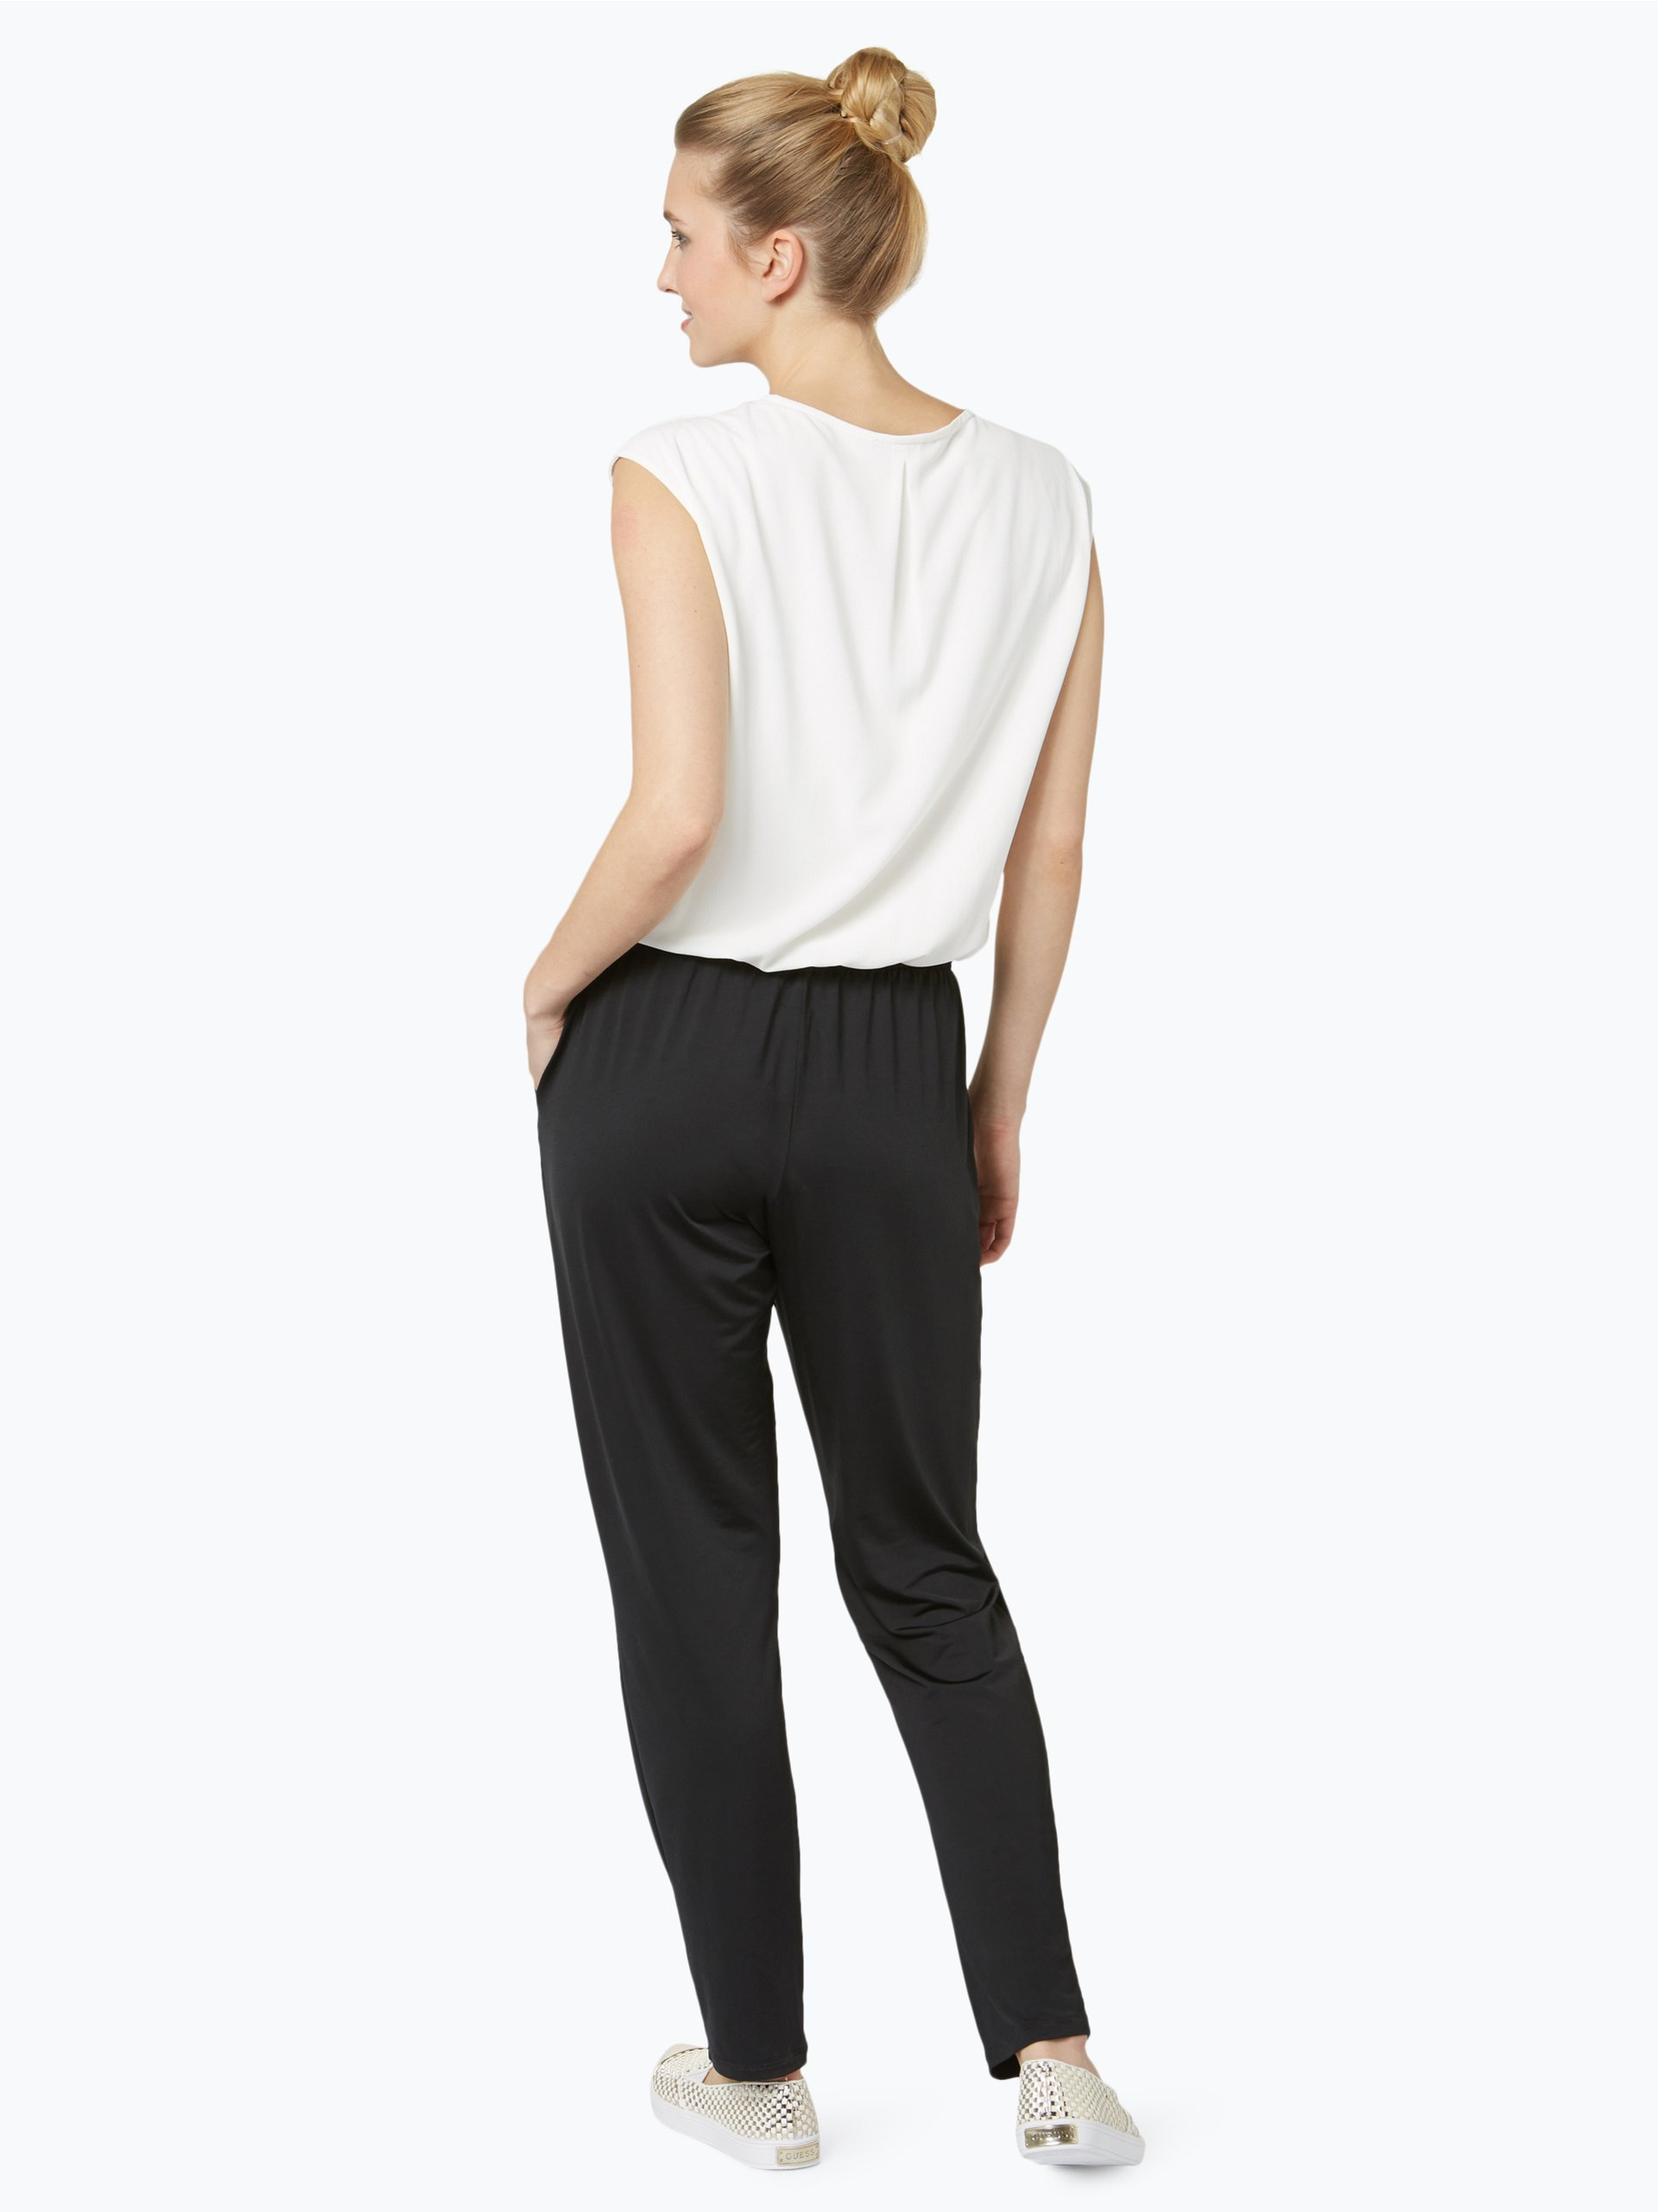 s oliver black label damen jumpsuit 2 online kaufen peek und cloppenburg de. Black Bedroom Furniture Sets. Home Design Ideas